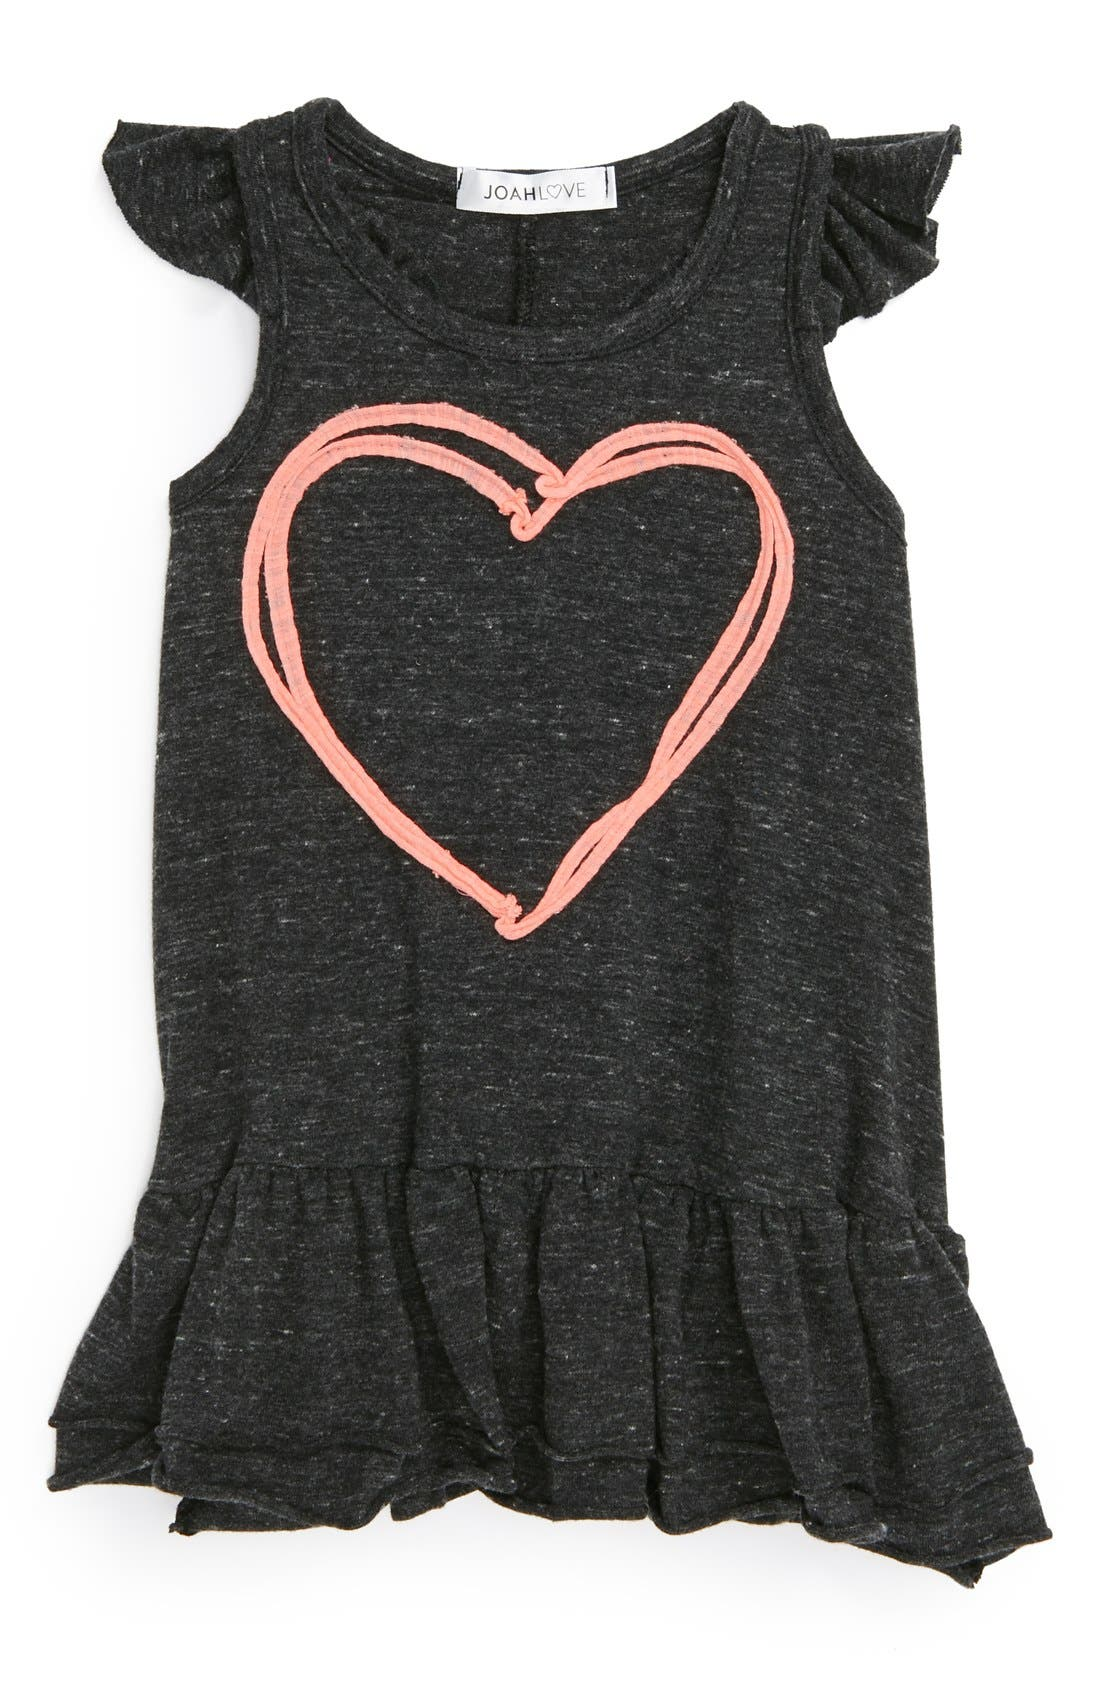 Alternate Image 1 Selected - Joah Love 'Heart' Ruffle Dress (Baby Girls)